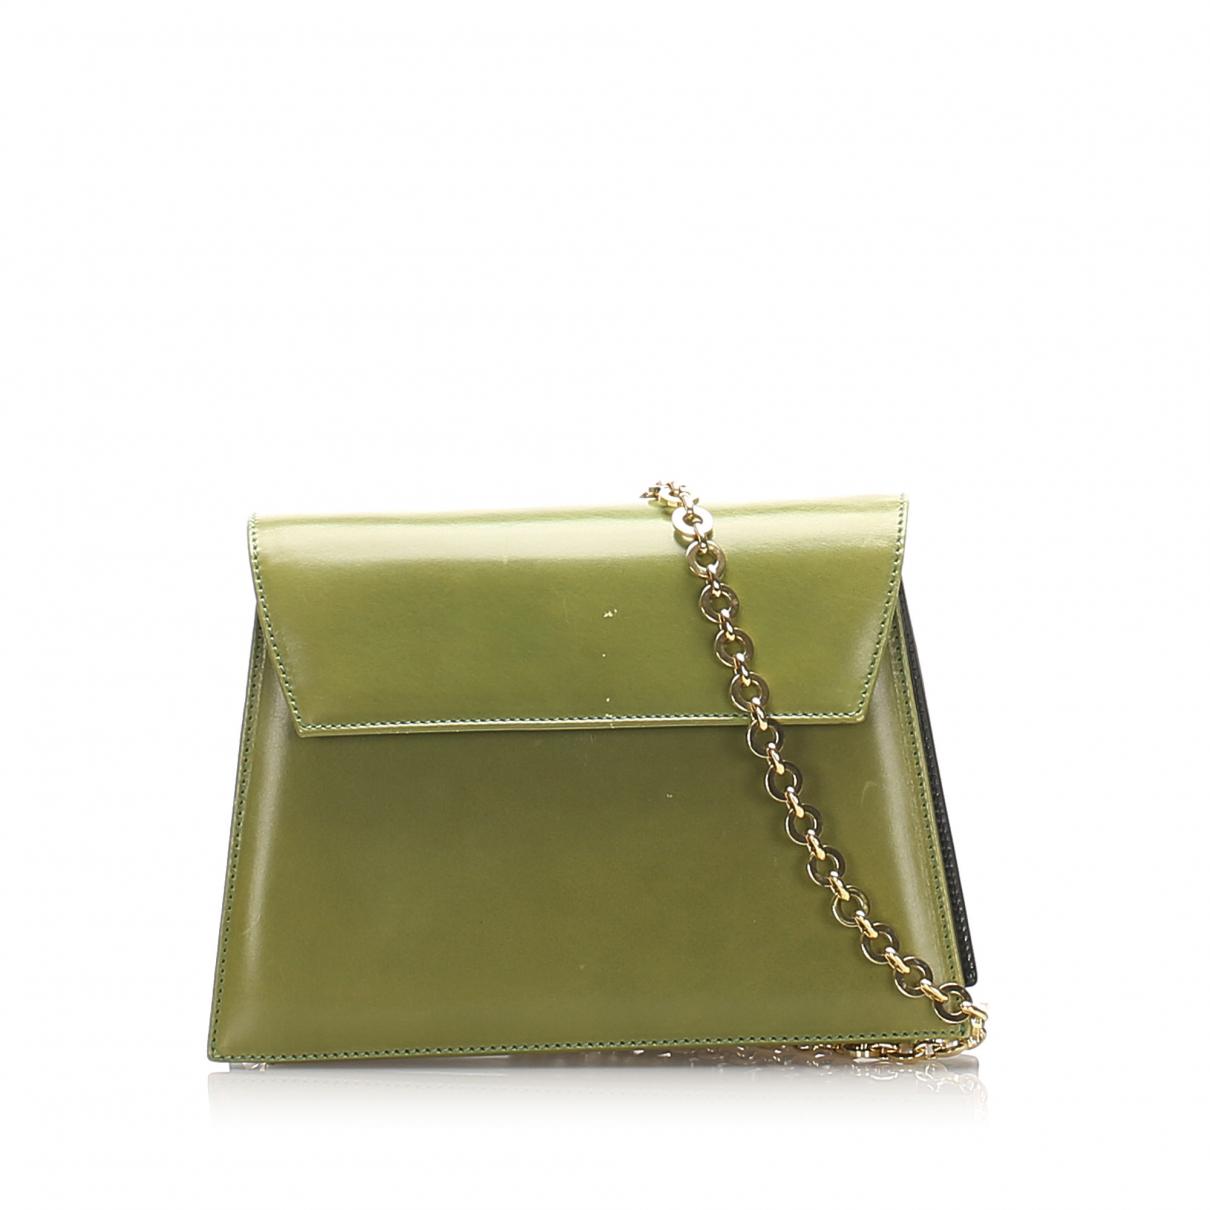 Salvatore Ferragamo \N Handtasche in  Gruen Leder